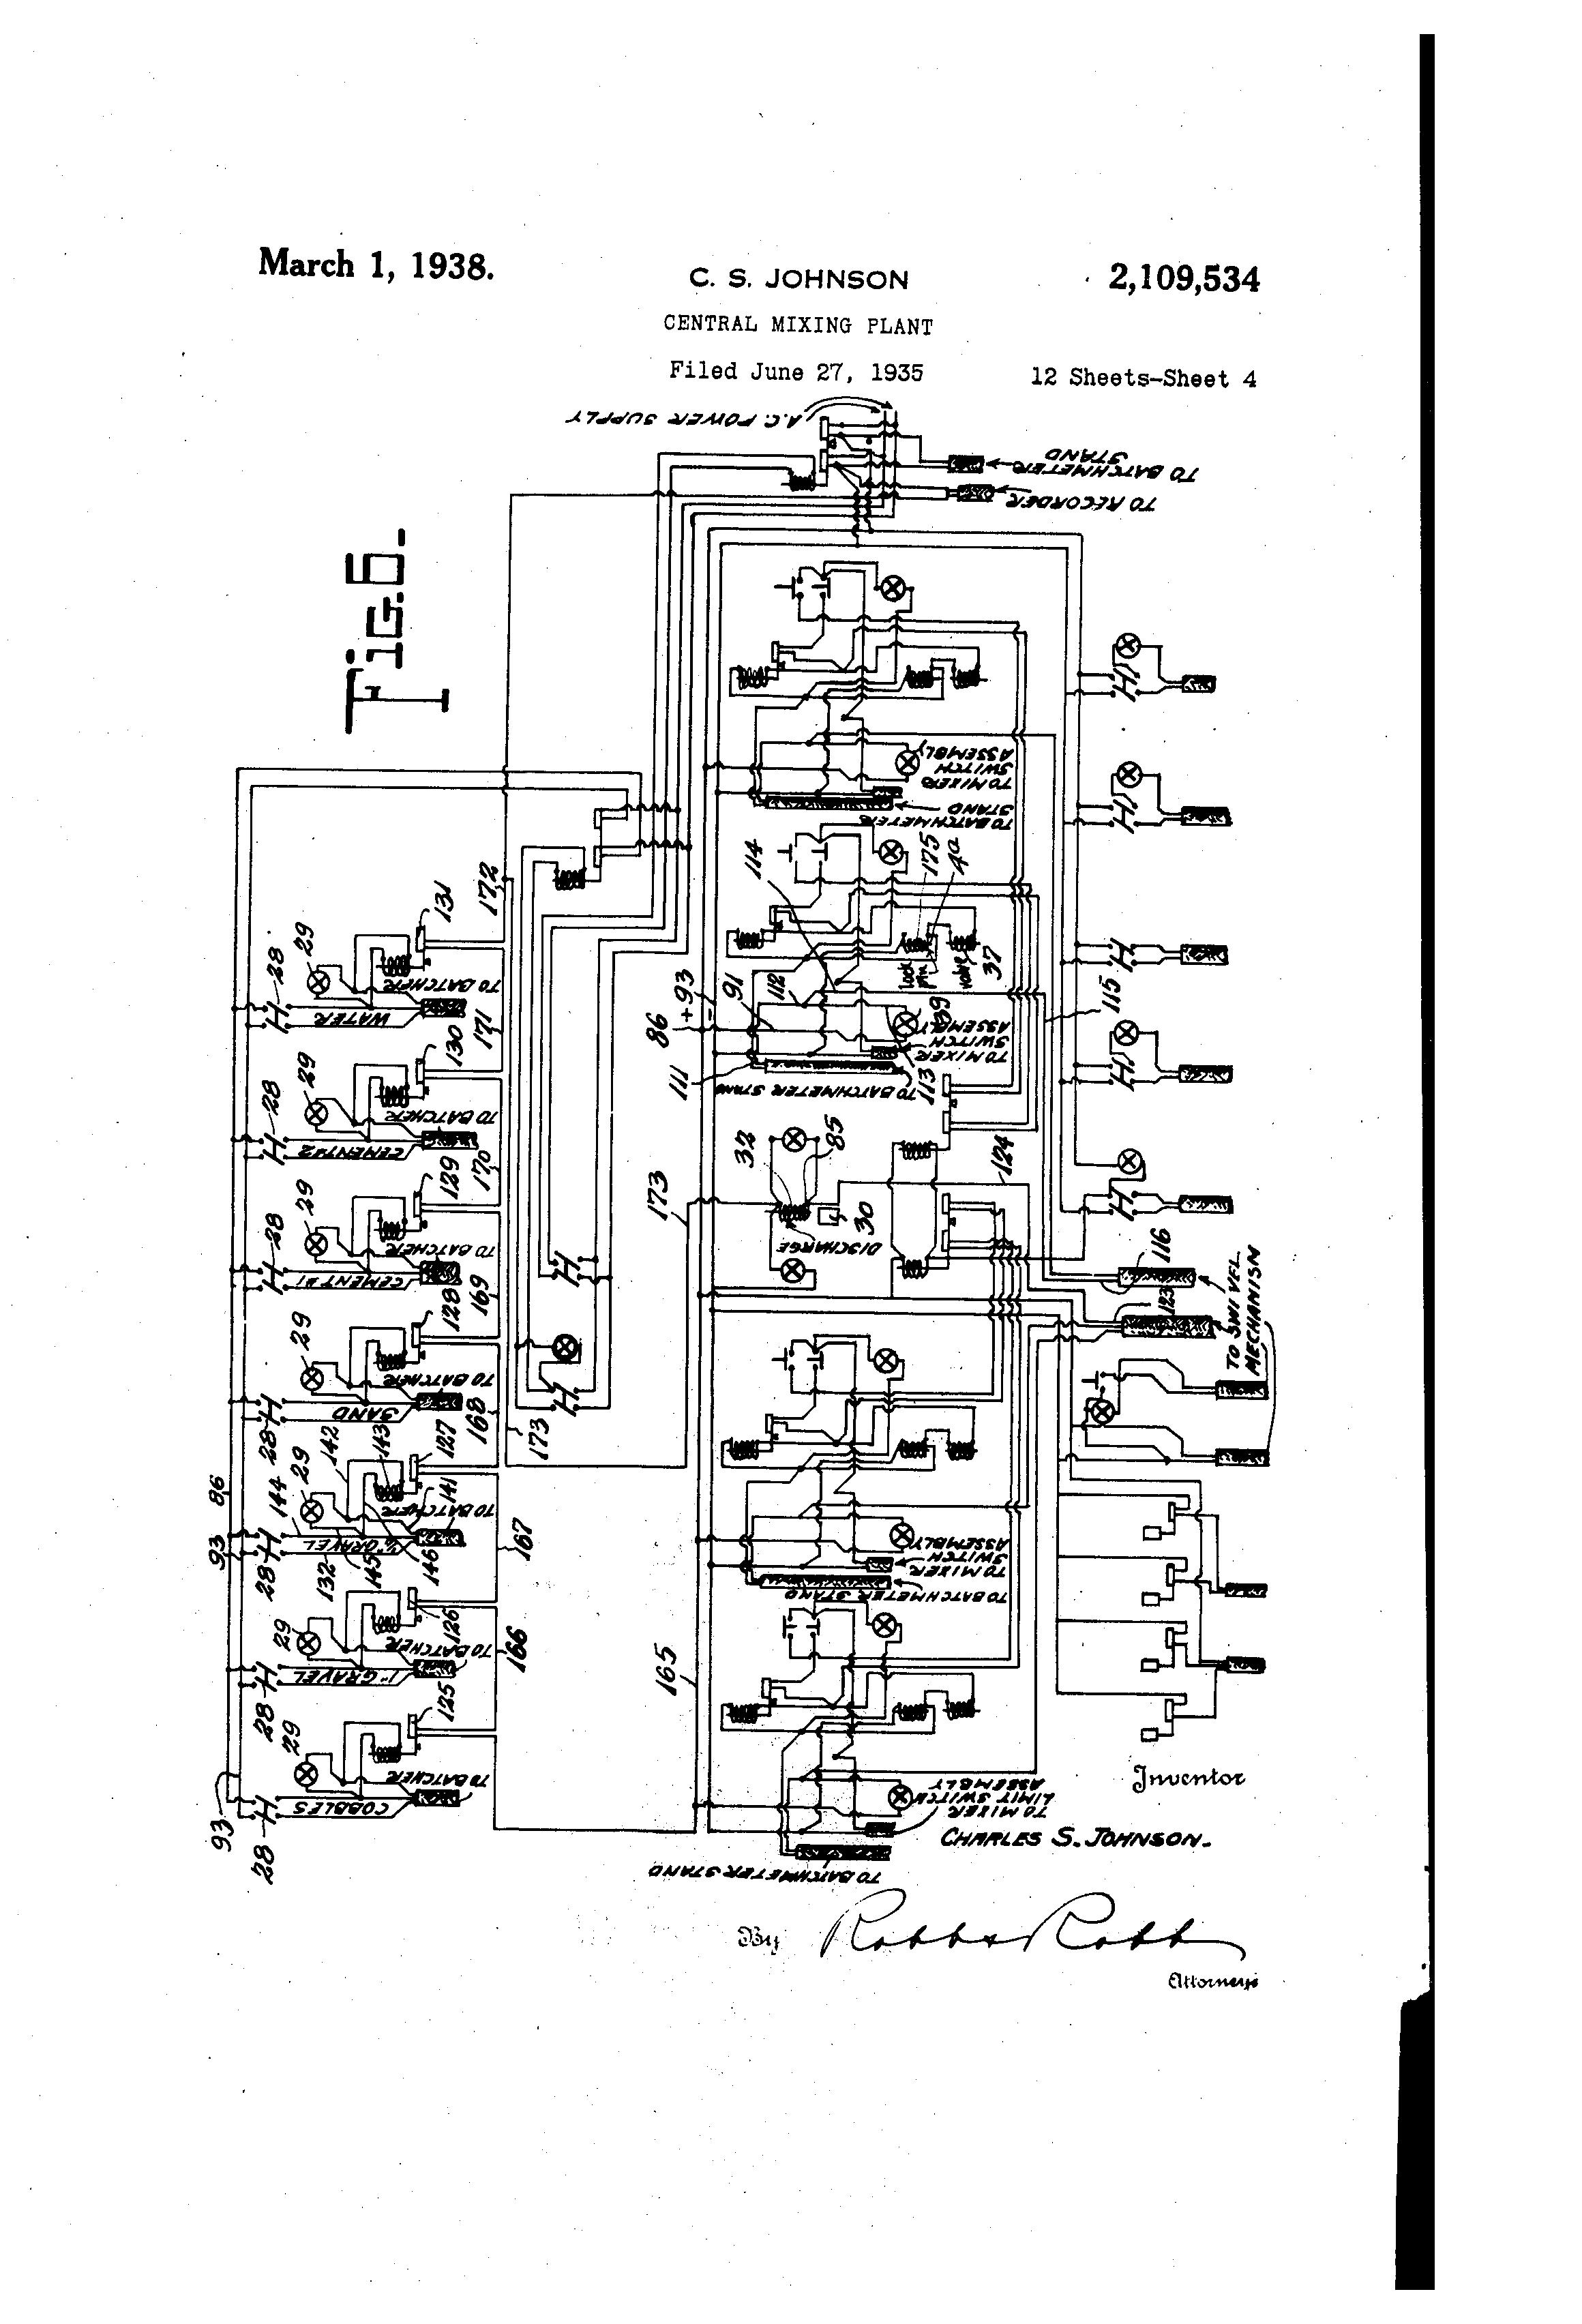 [DIAGRAM_3NM]  RW_6585] 1998 Mcneilus Wiring Diagram Schematic Wiring | Mcneilus Wiring Schematic Chute Lock |  | Exxlu Inrebe Oidei Nful Mohammedshrine Librar Wiring 101